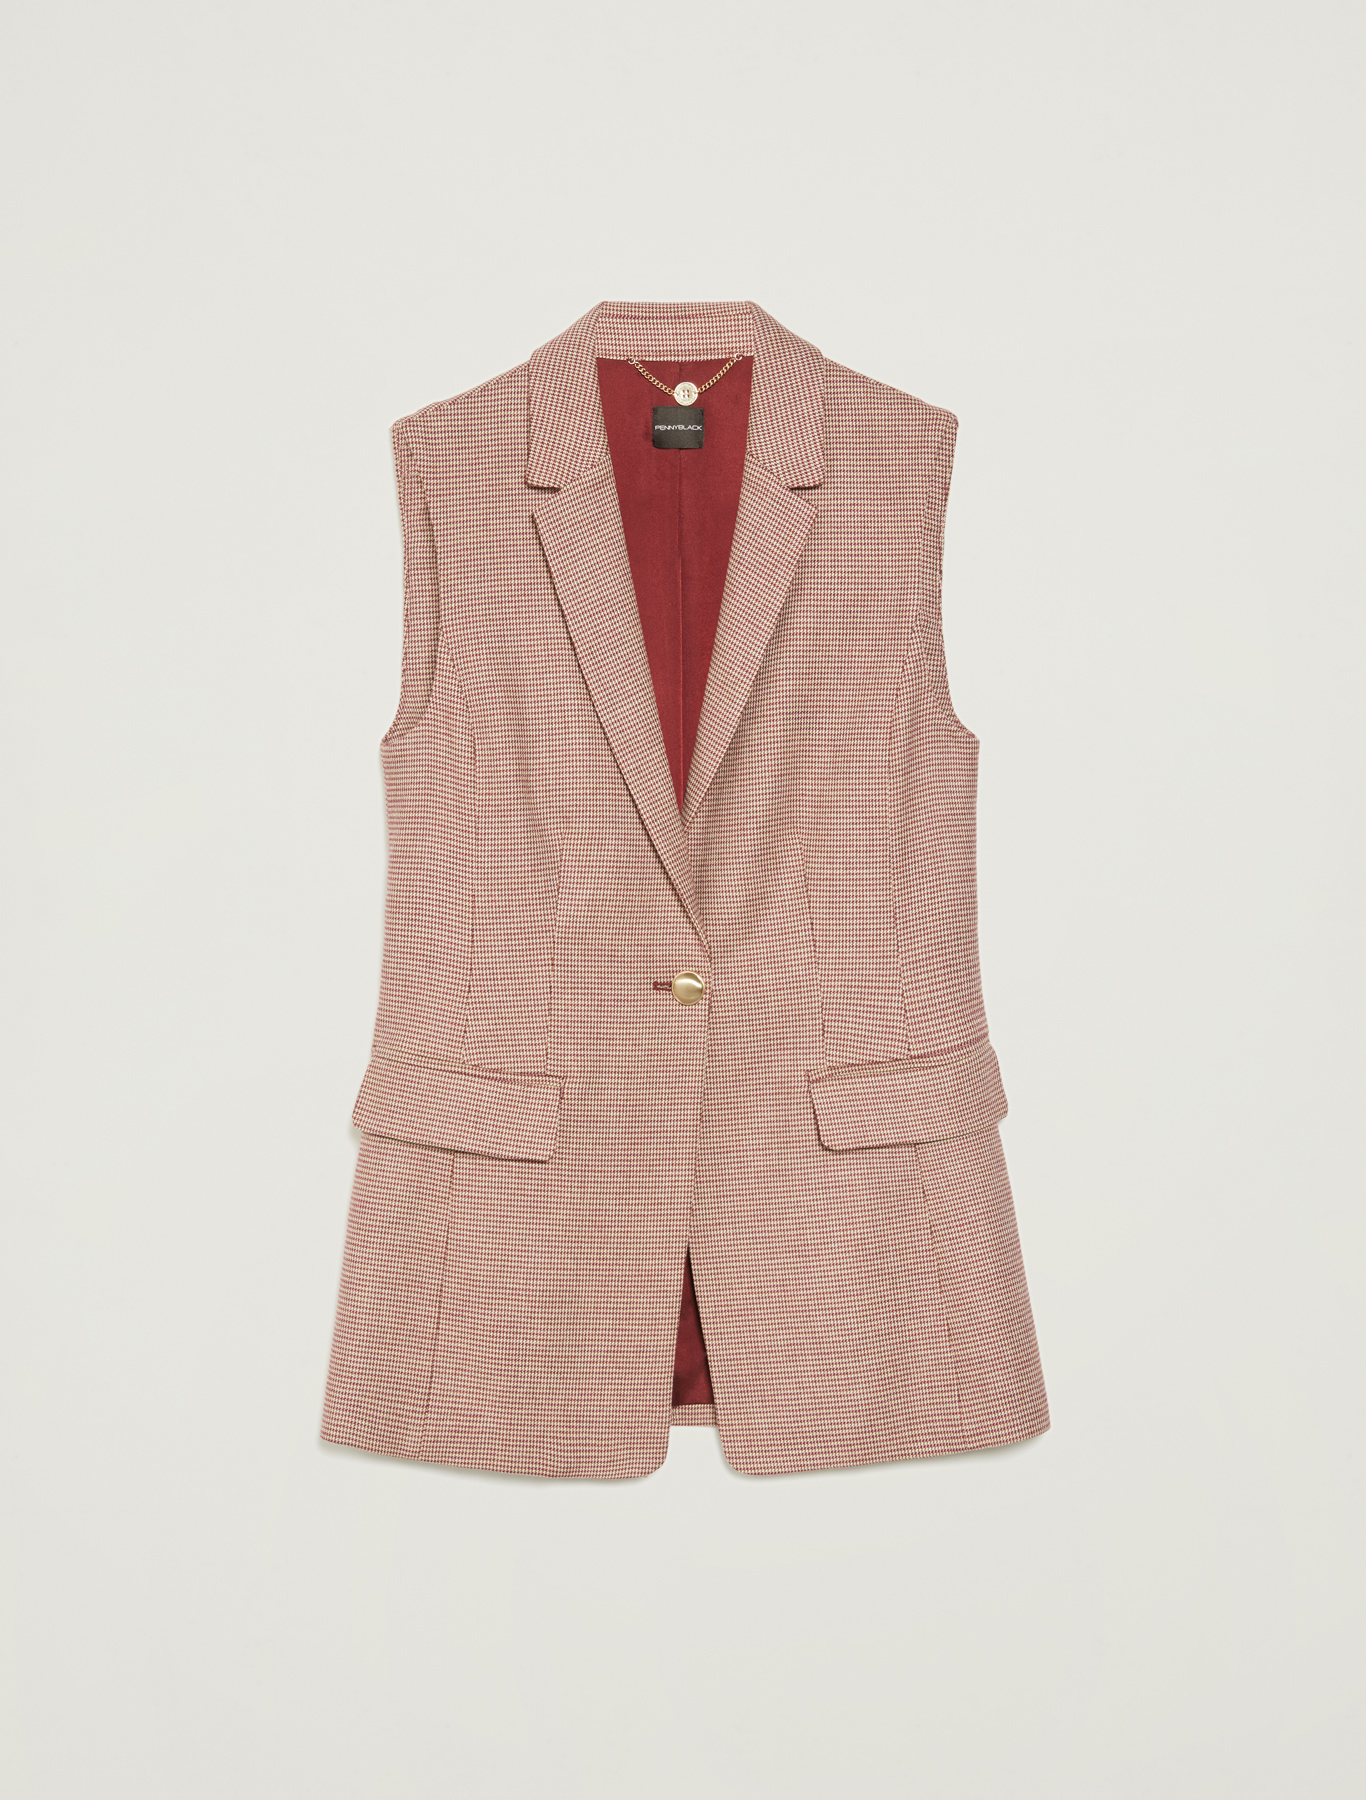 Houndstooth gilet blazer - red pattern - pennyblack